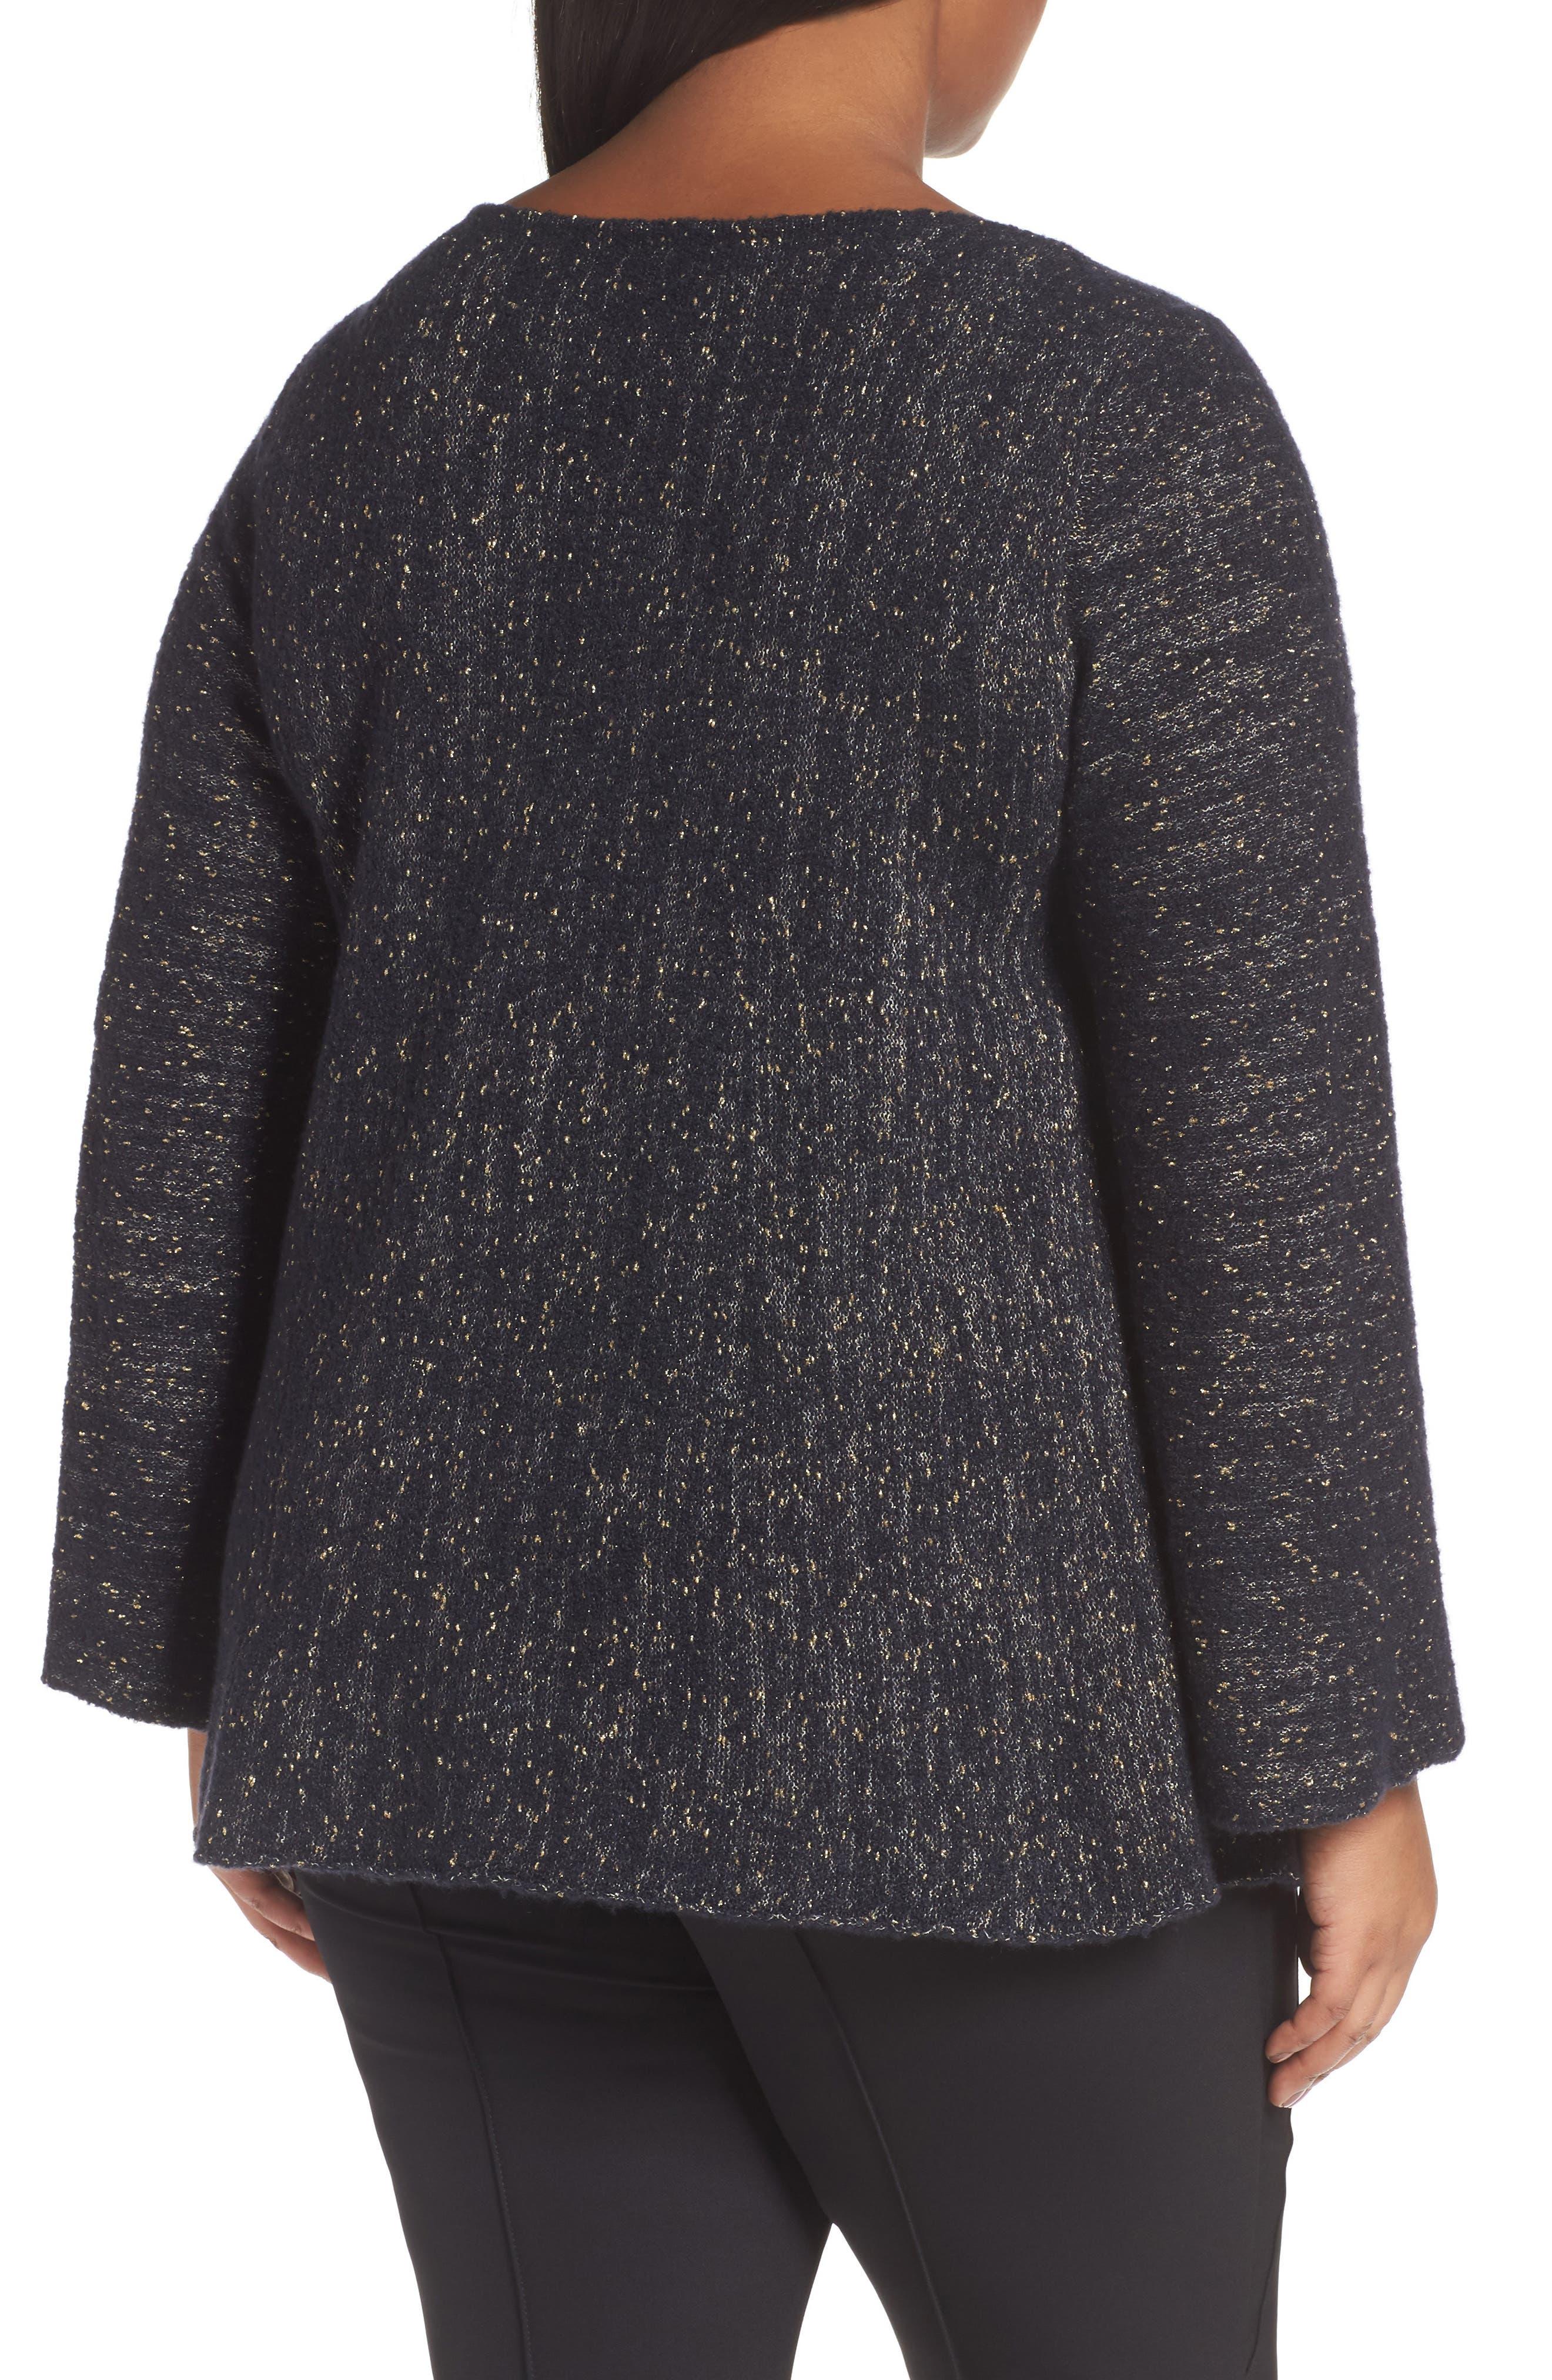 Alternate Image 2  - Lafayette 148 Metallic Knit A-Line Sweater (Plus Size)